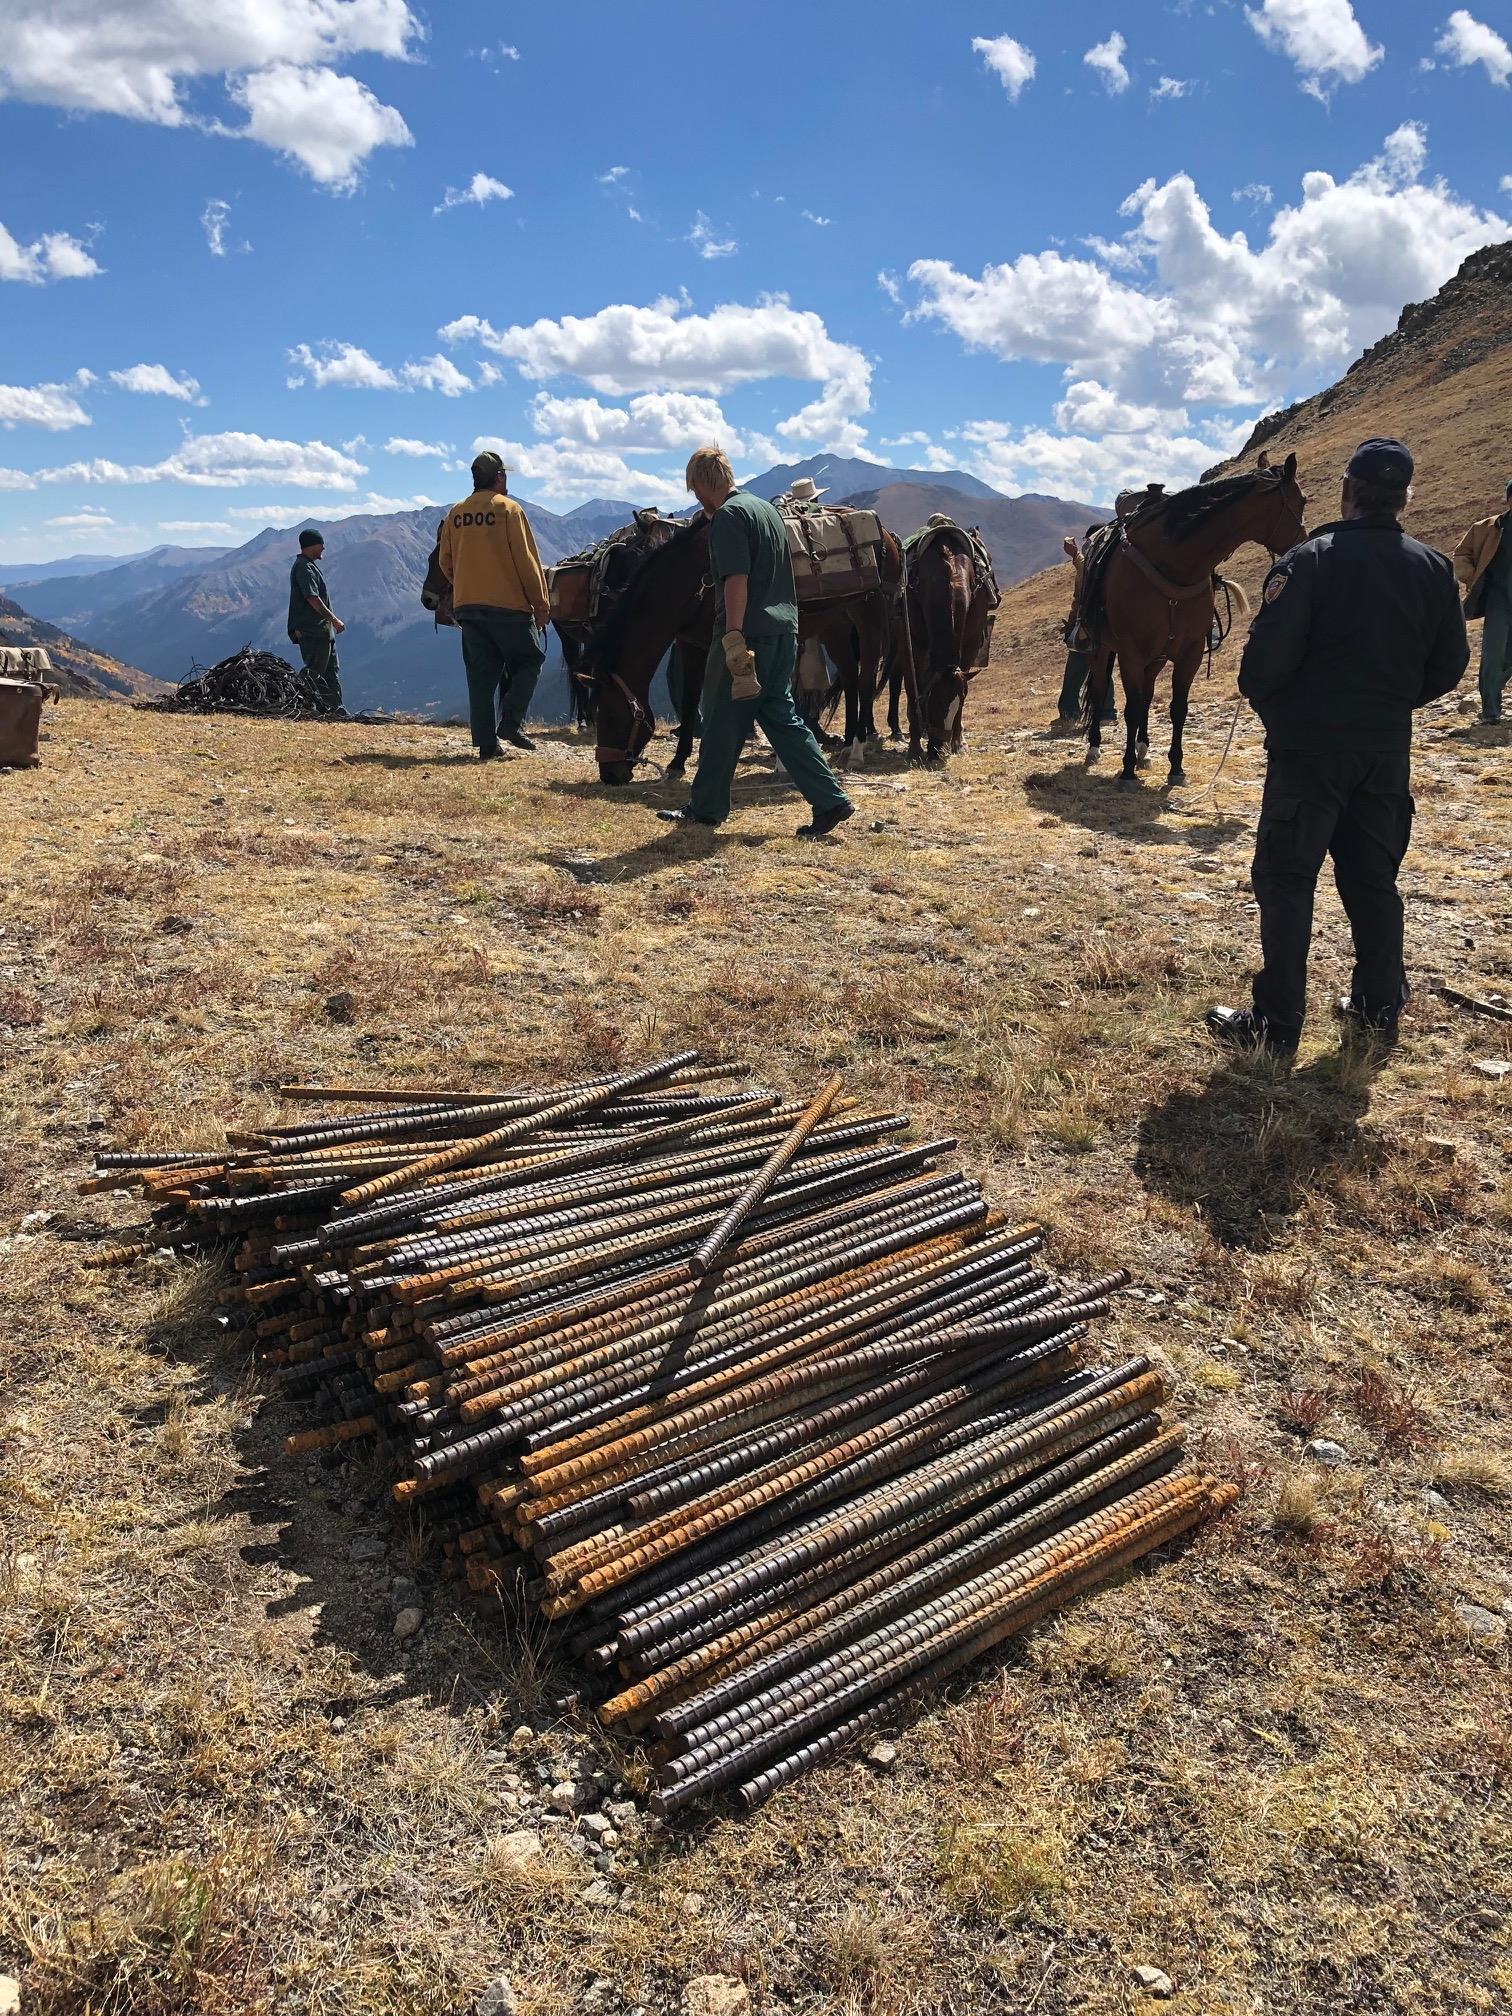 Stack of large rebar awaiting mule-loading, 10lbs per piece